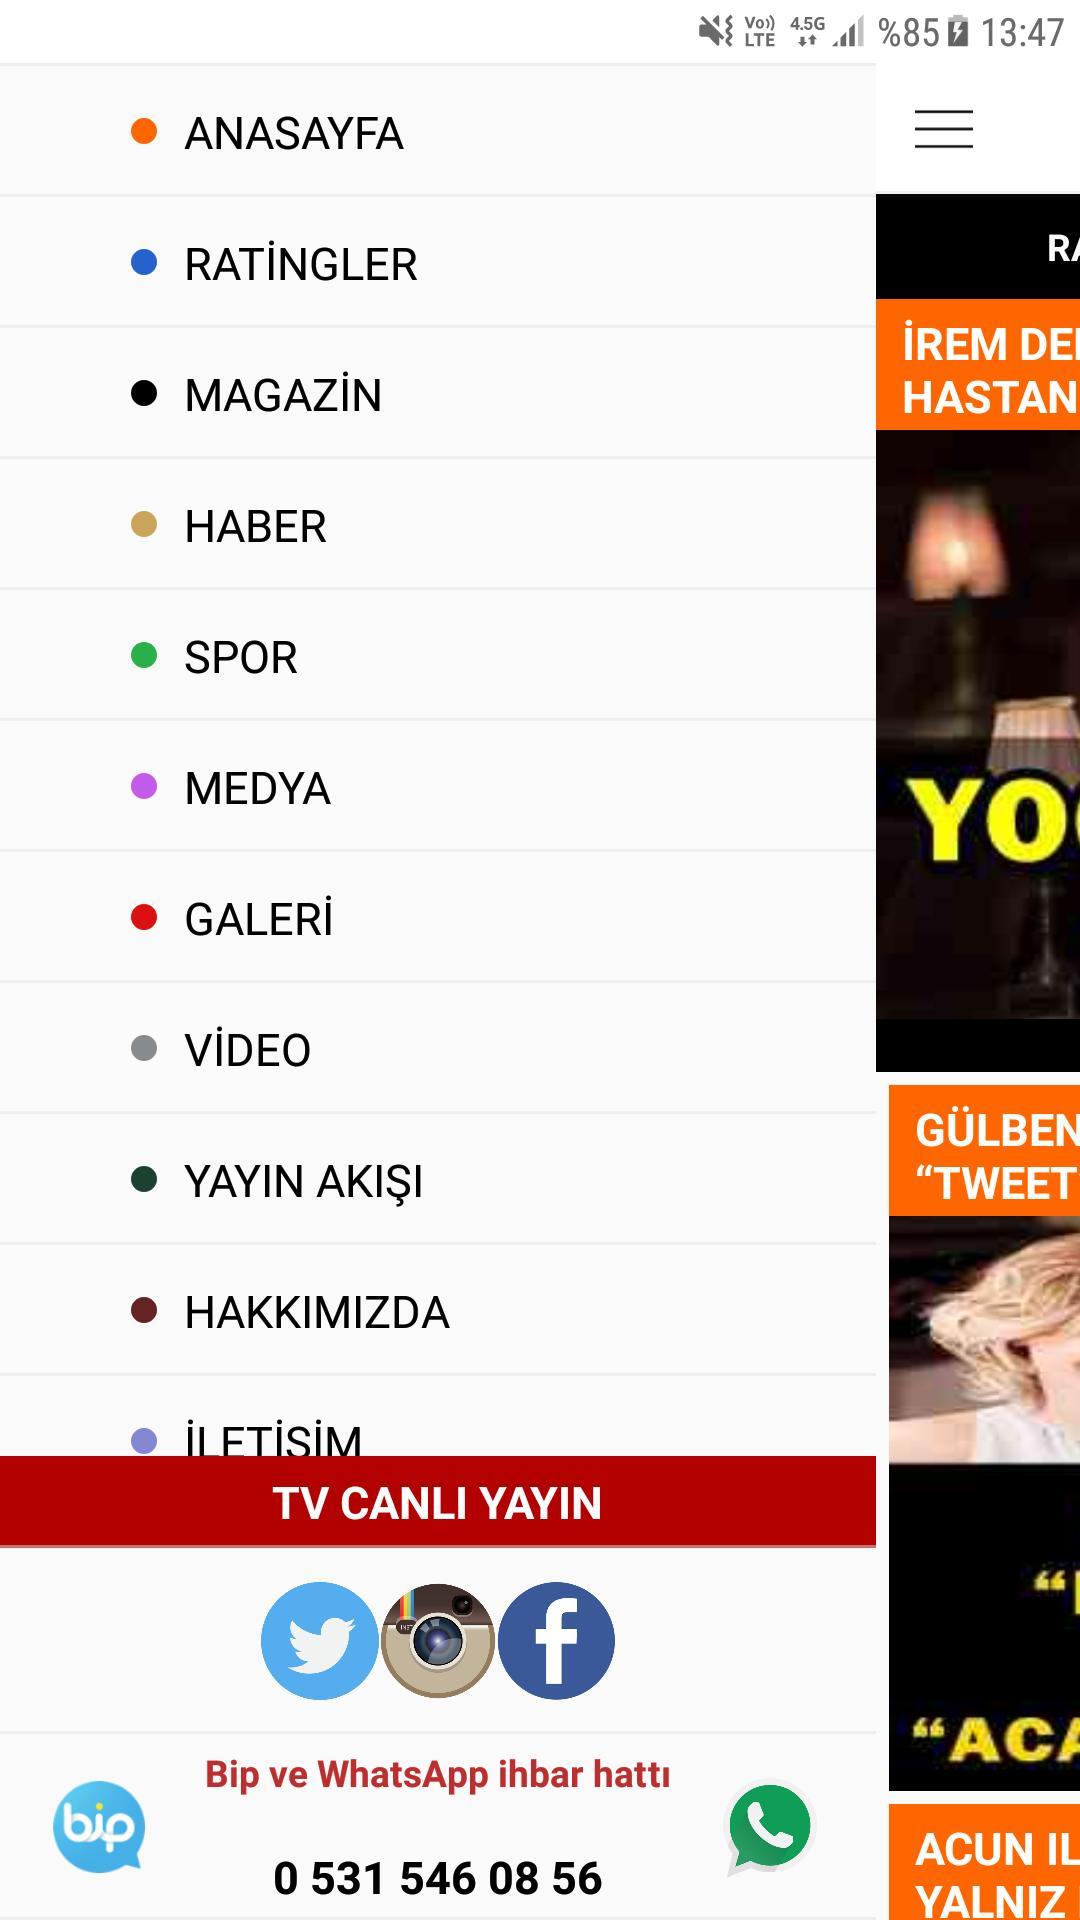 Uçankuş TV for Android - APK Download